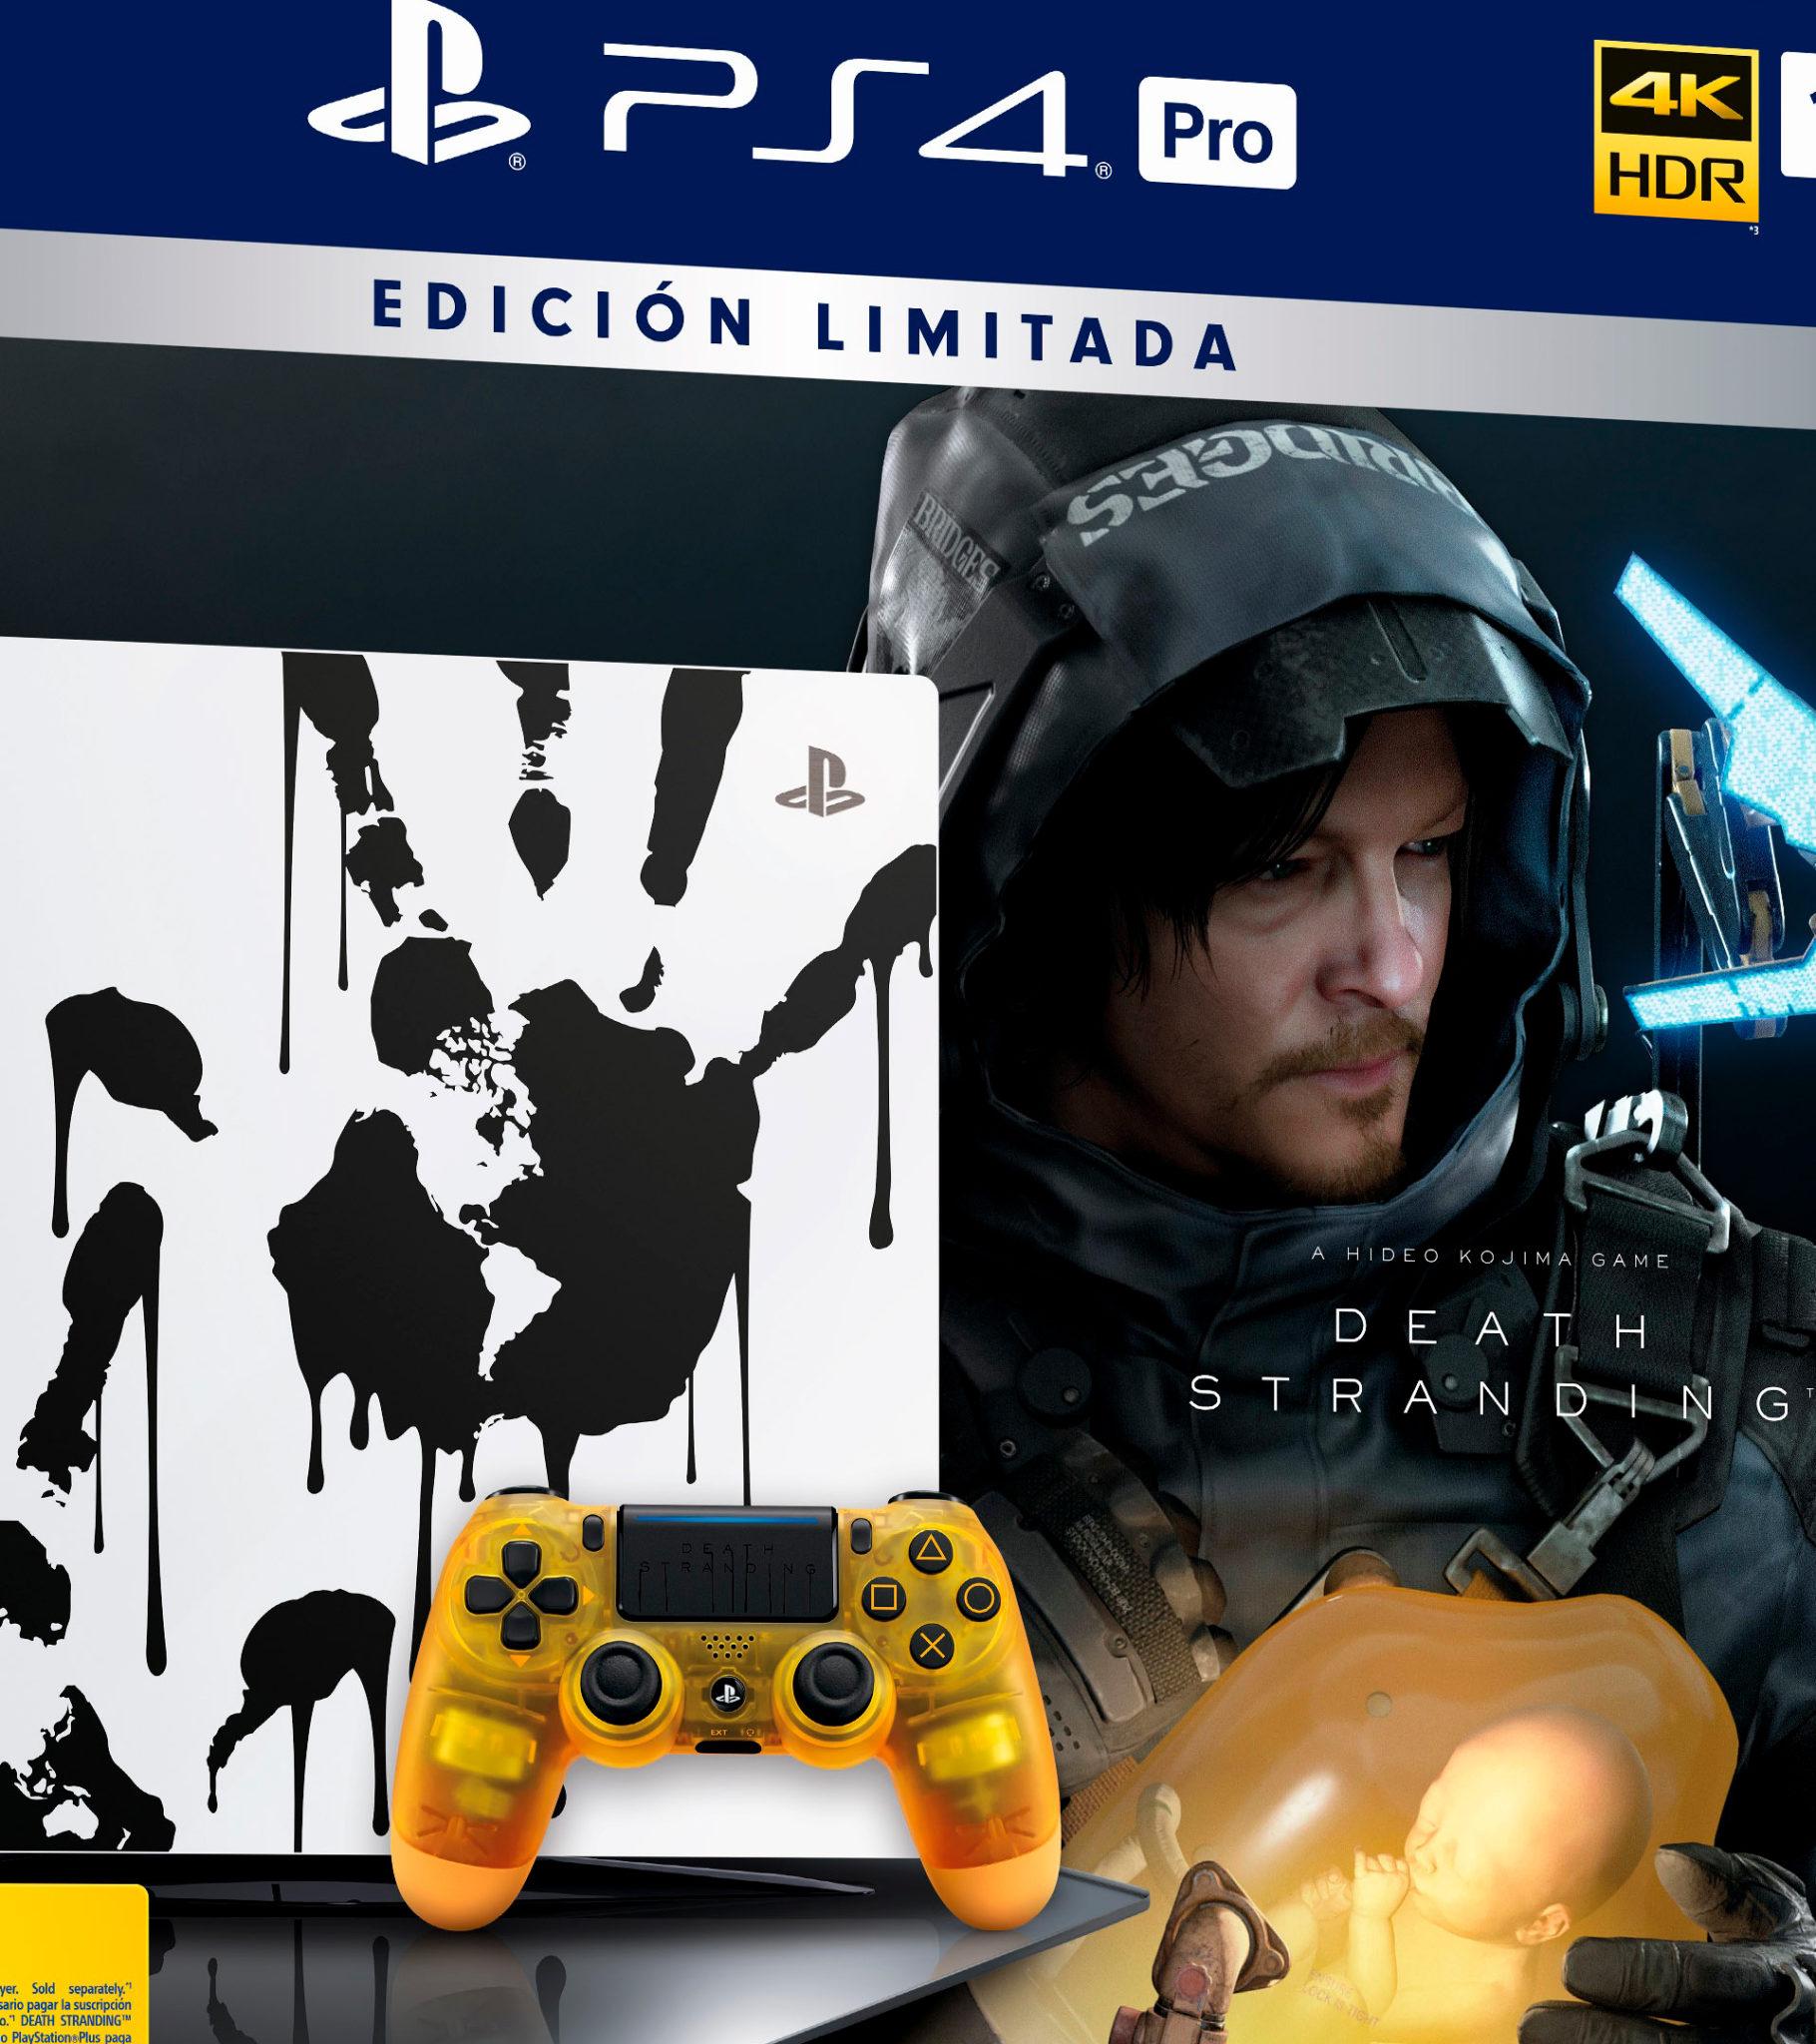 PlayStation 4 Pro 1TB Death Stranding